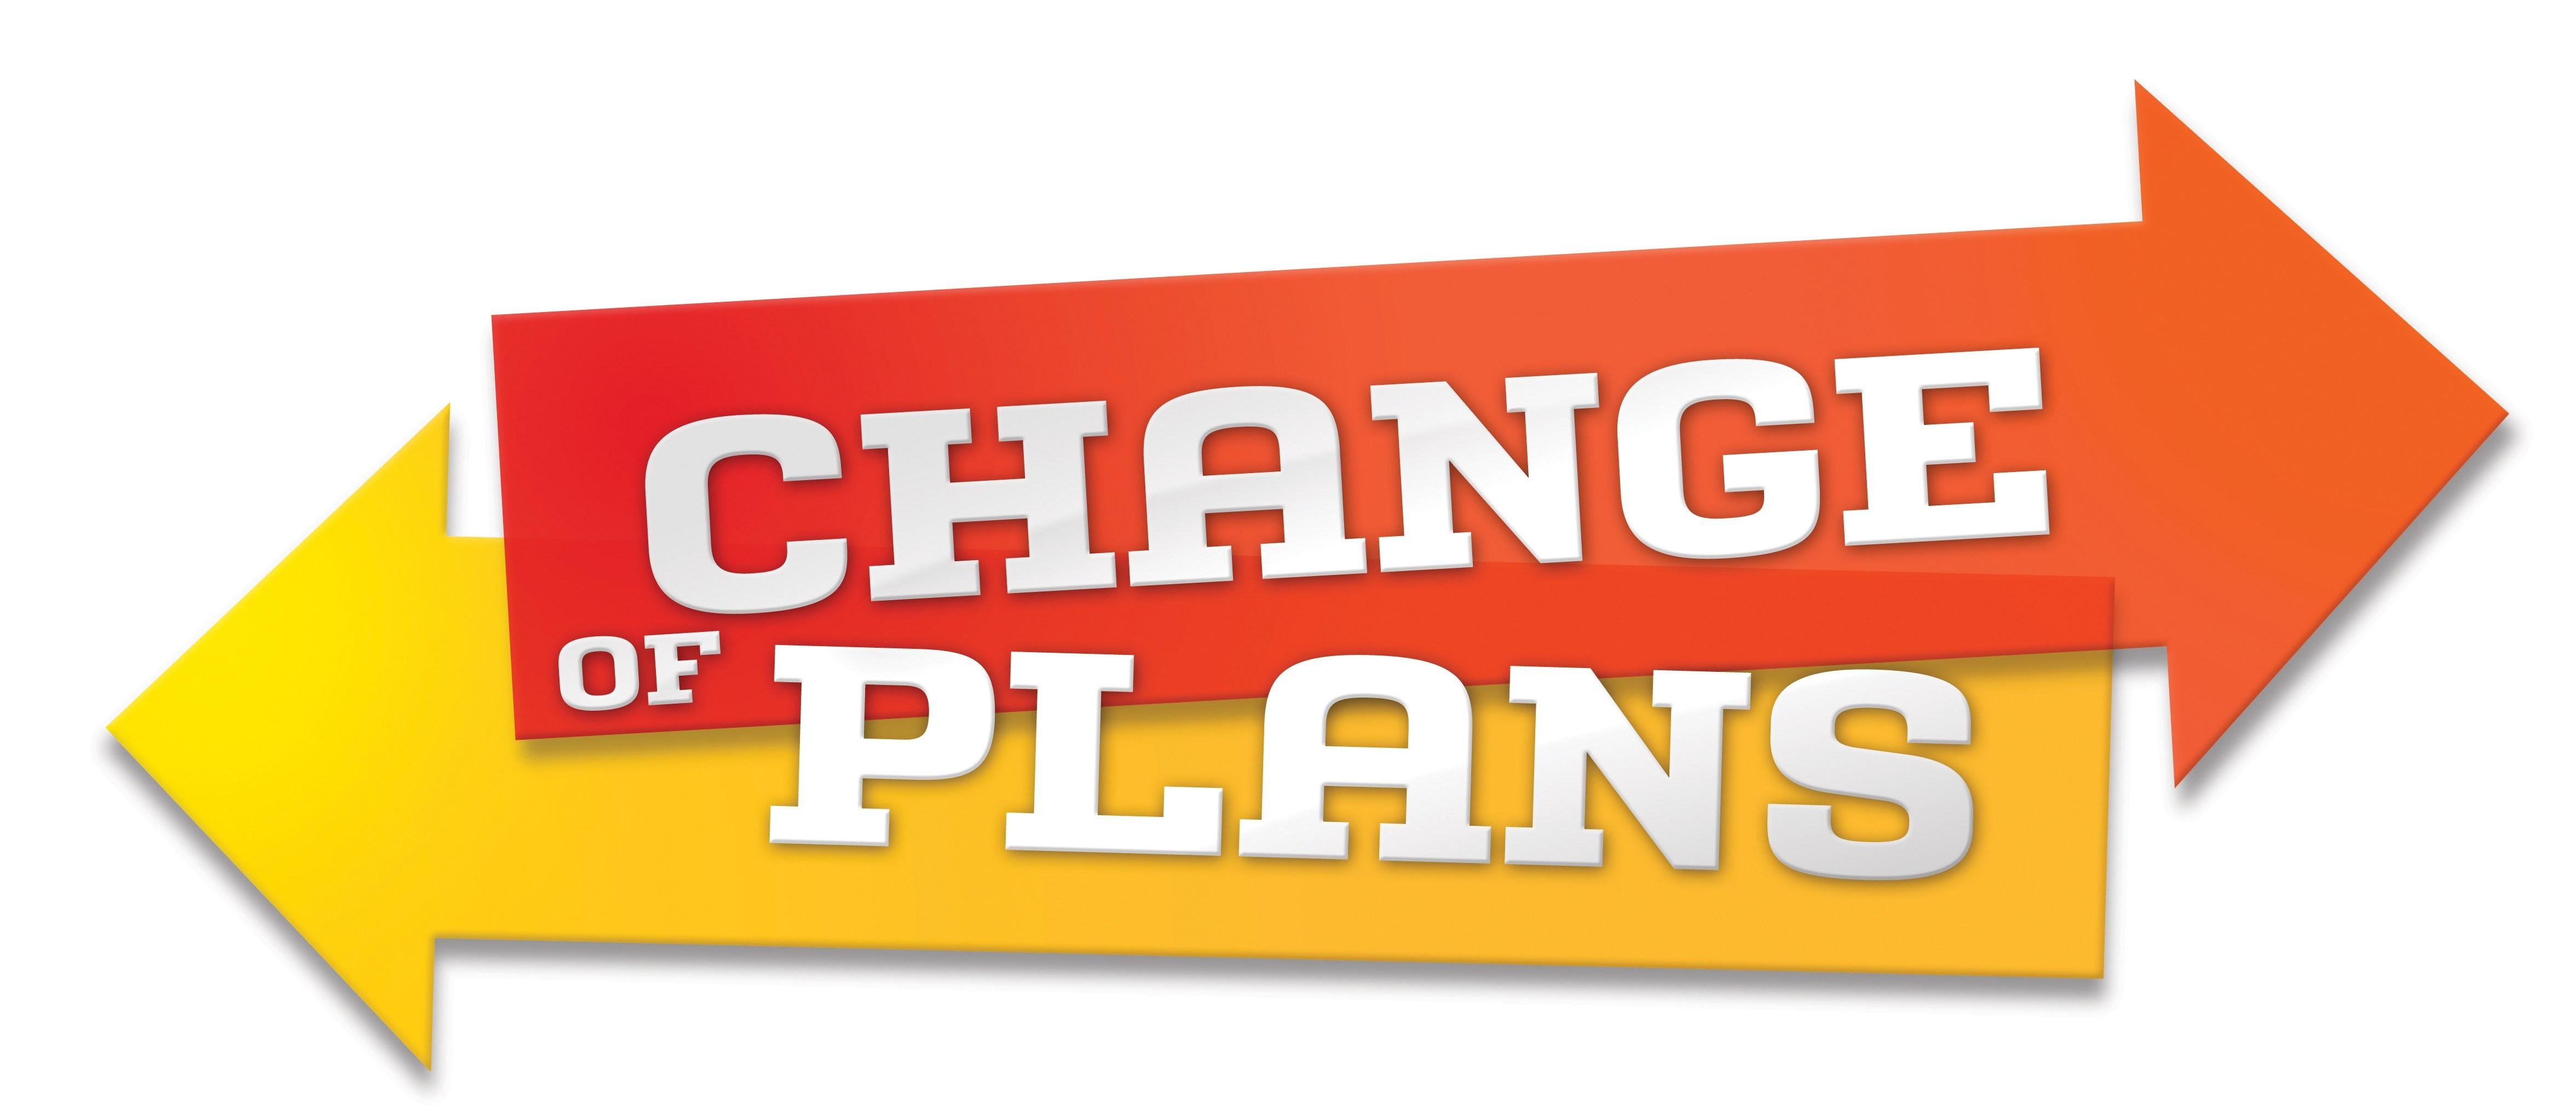 Schedule change clipart vector free Class Schedule Changes! - Dore Fay Strock vector free